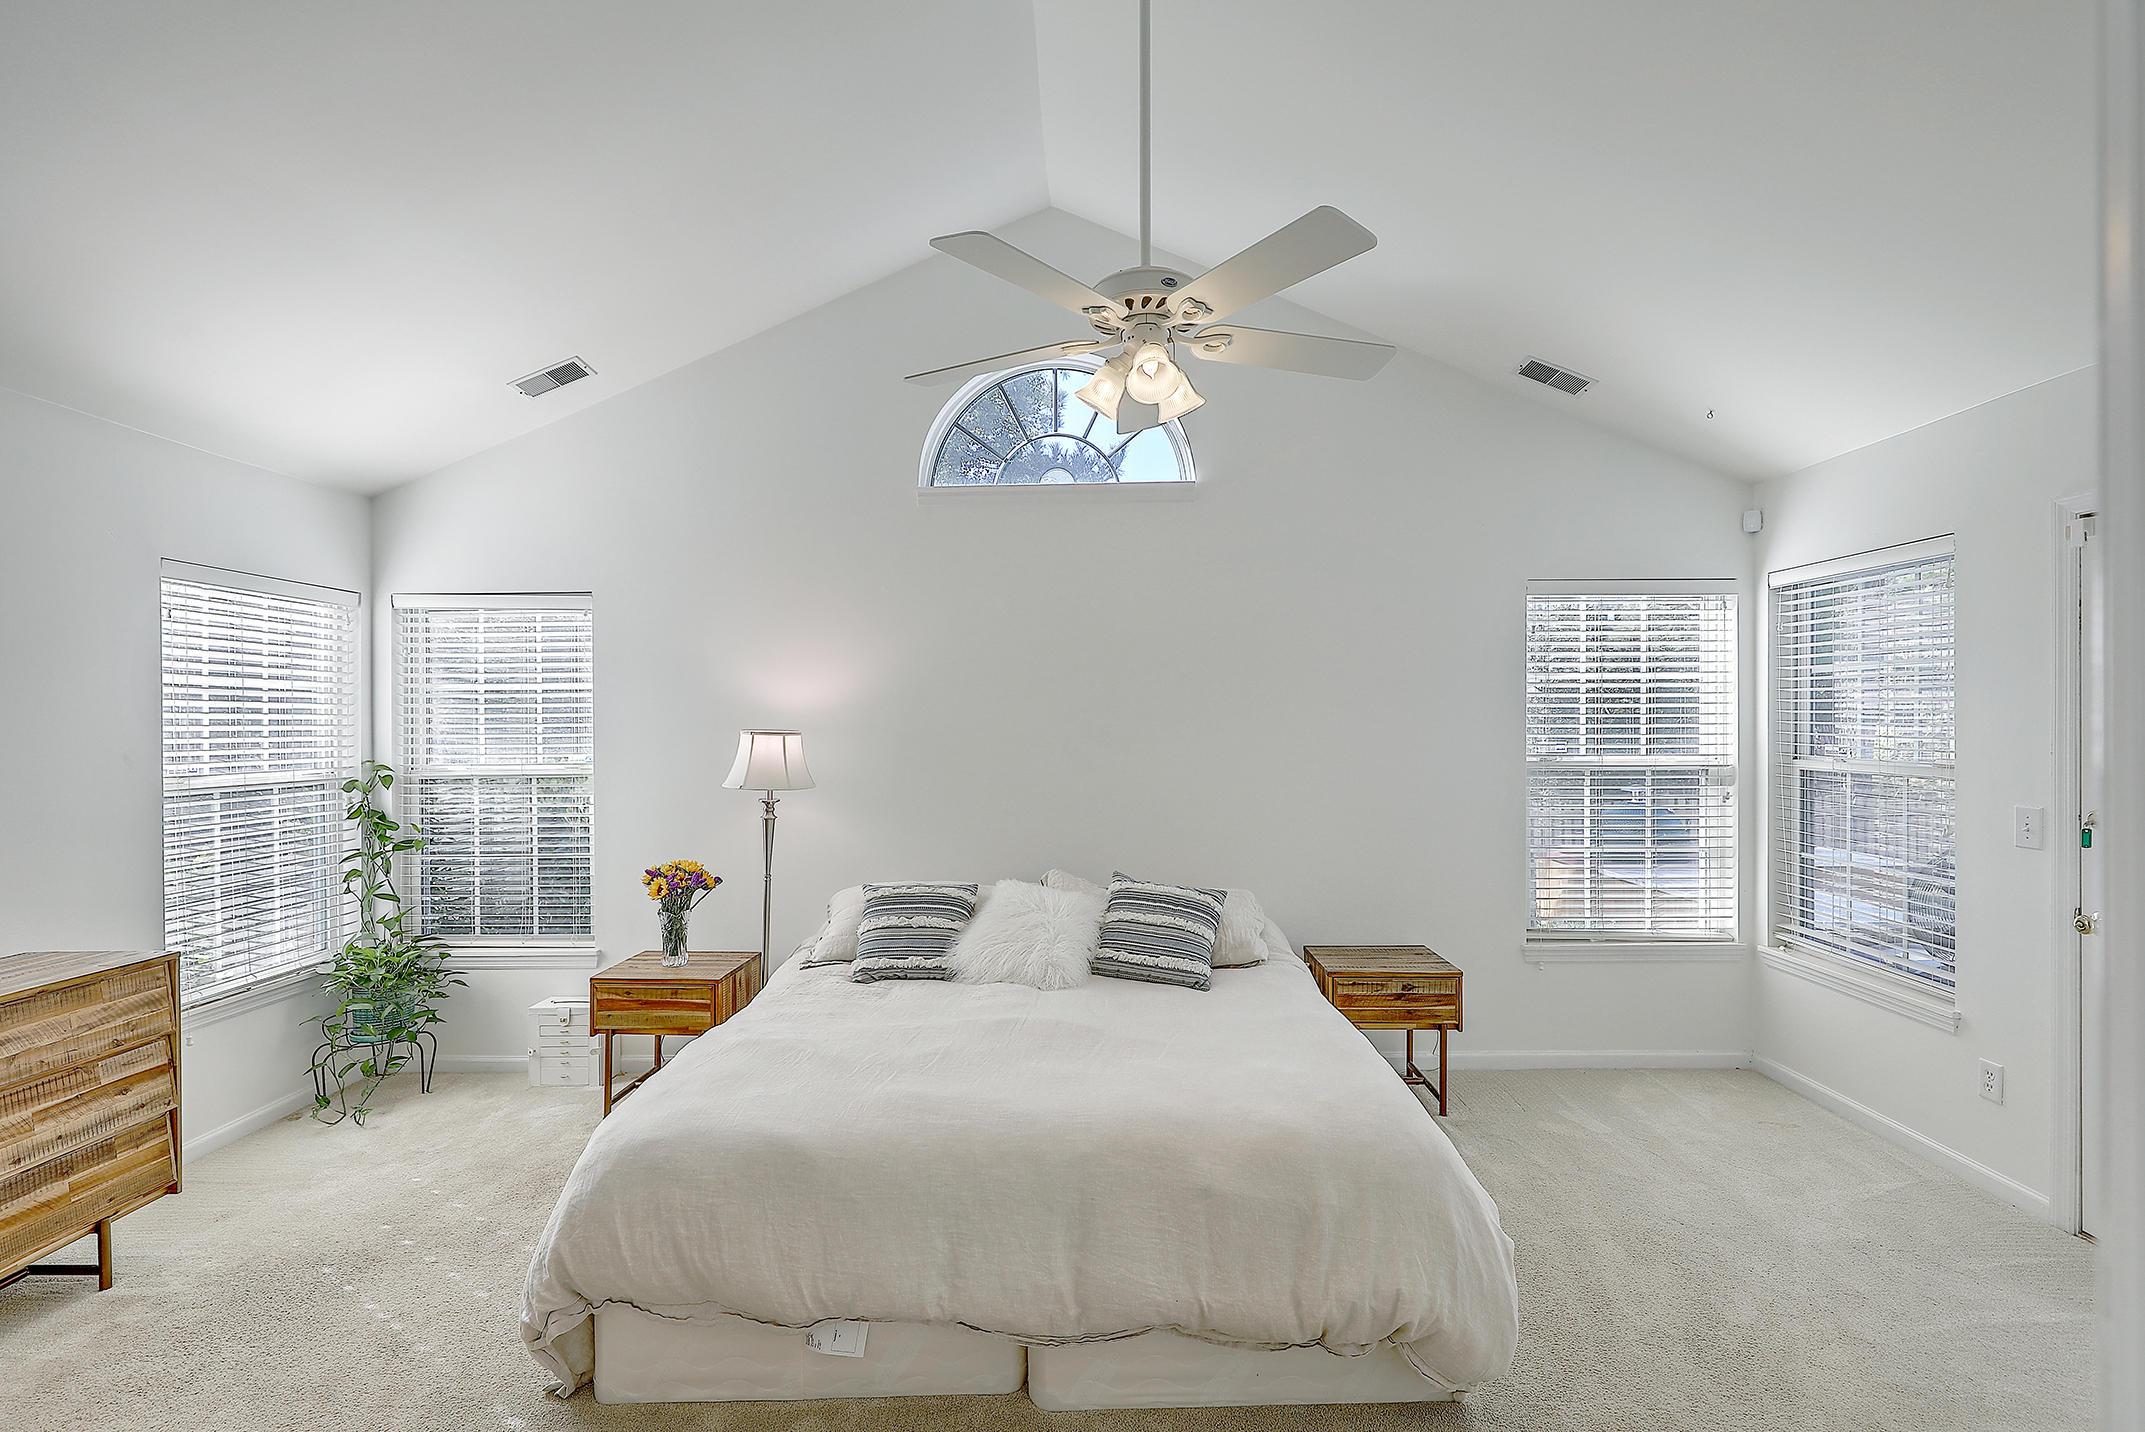 Dunes West Homes For Sale - 1471 Cypress Pointe, Mount Pleasant, SC - 4